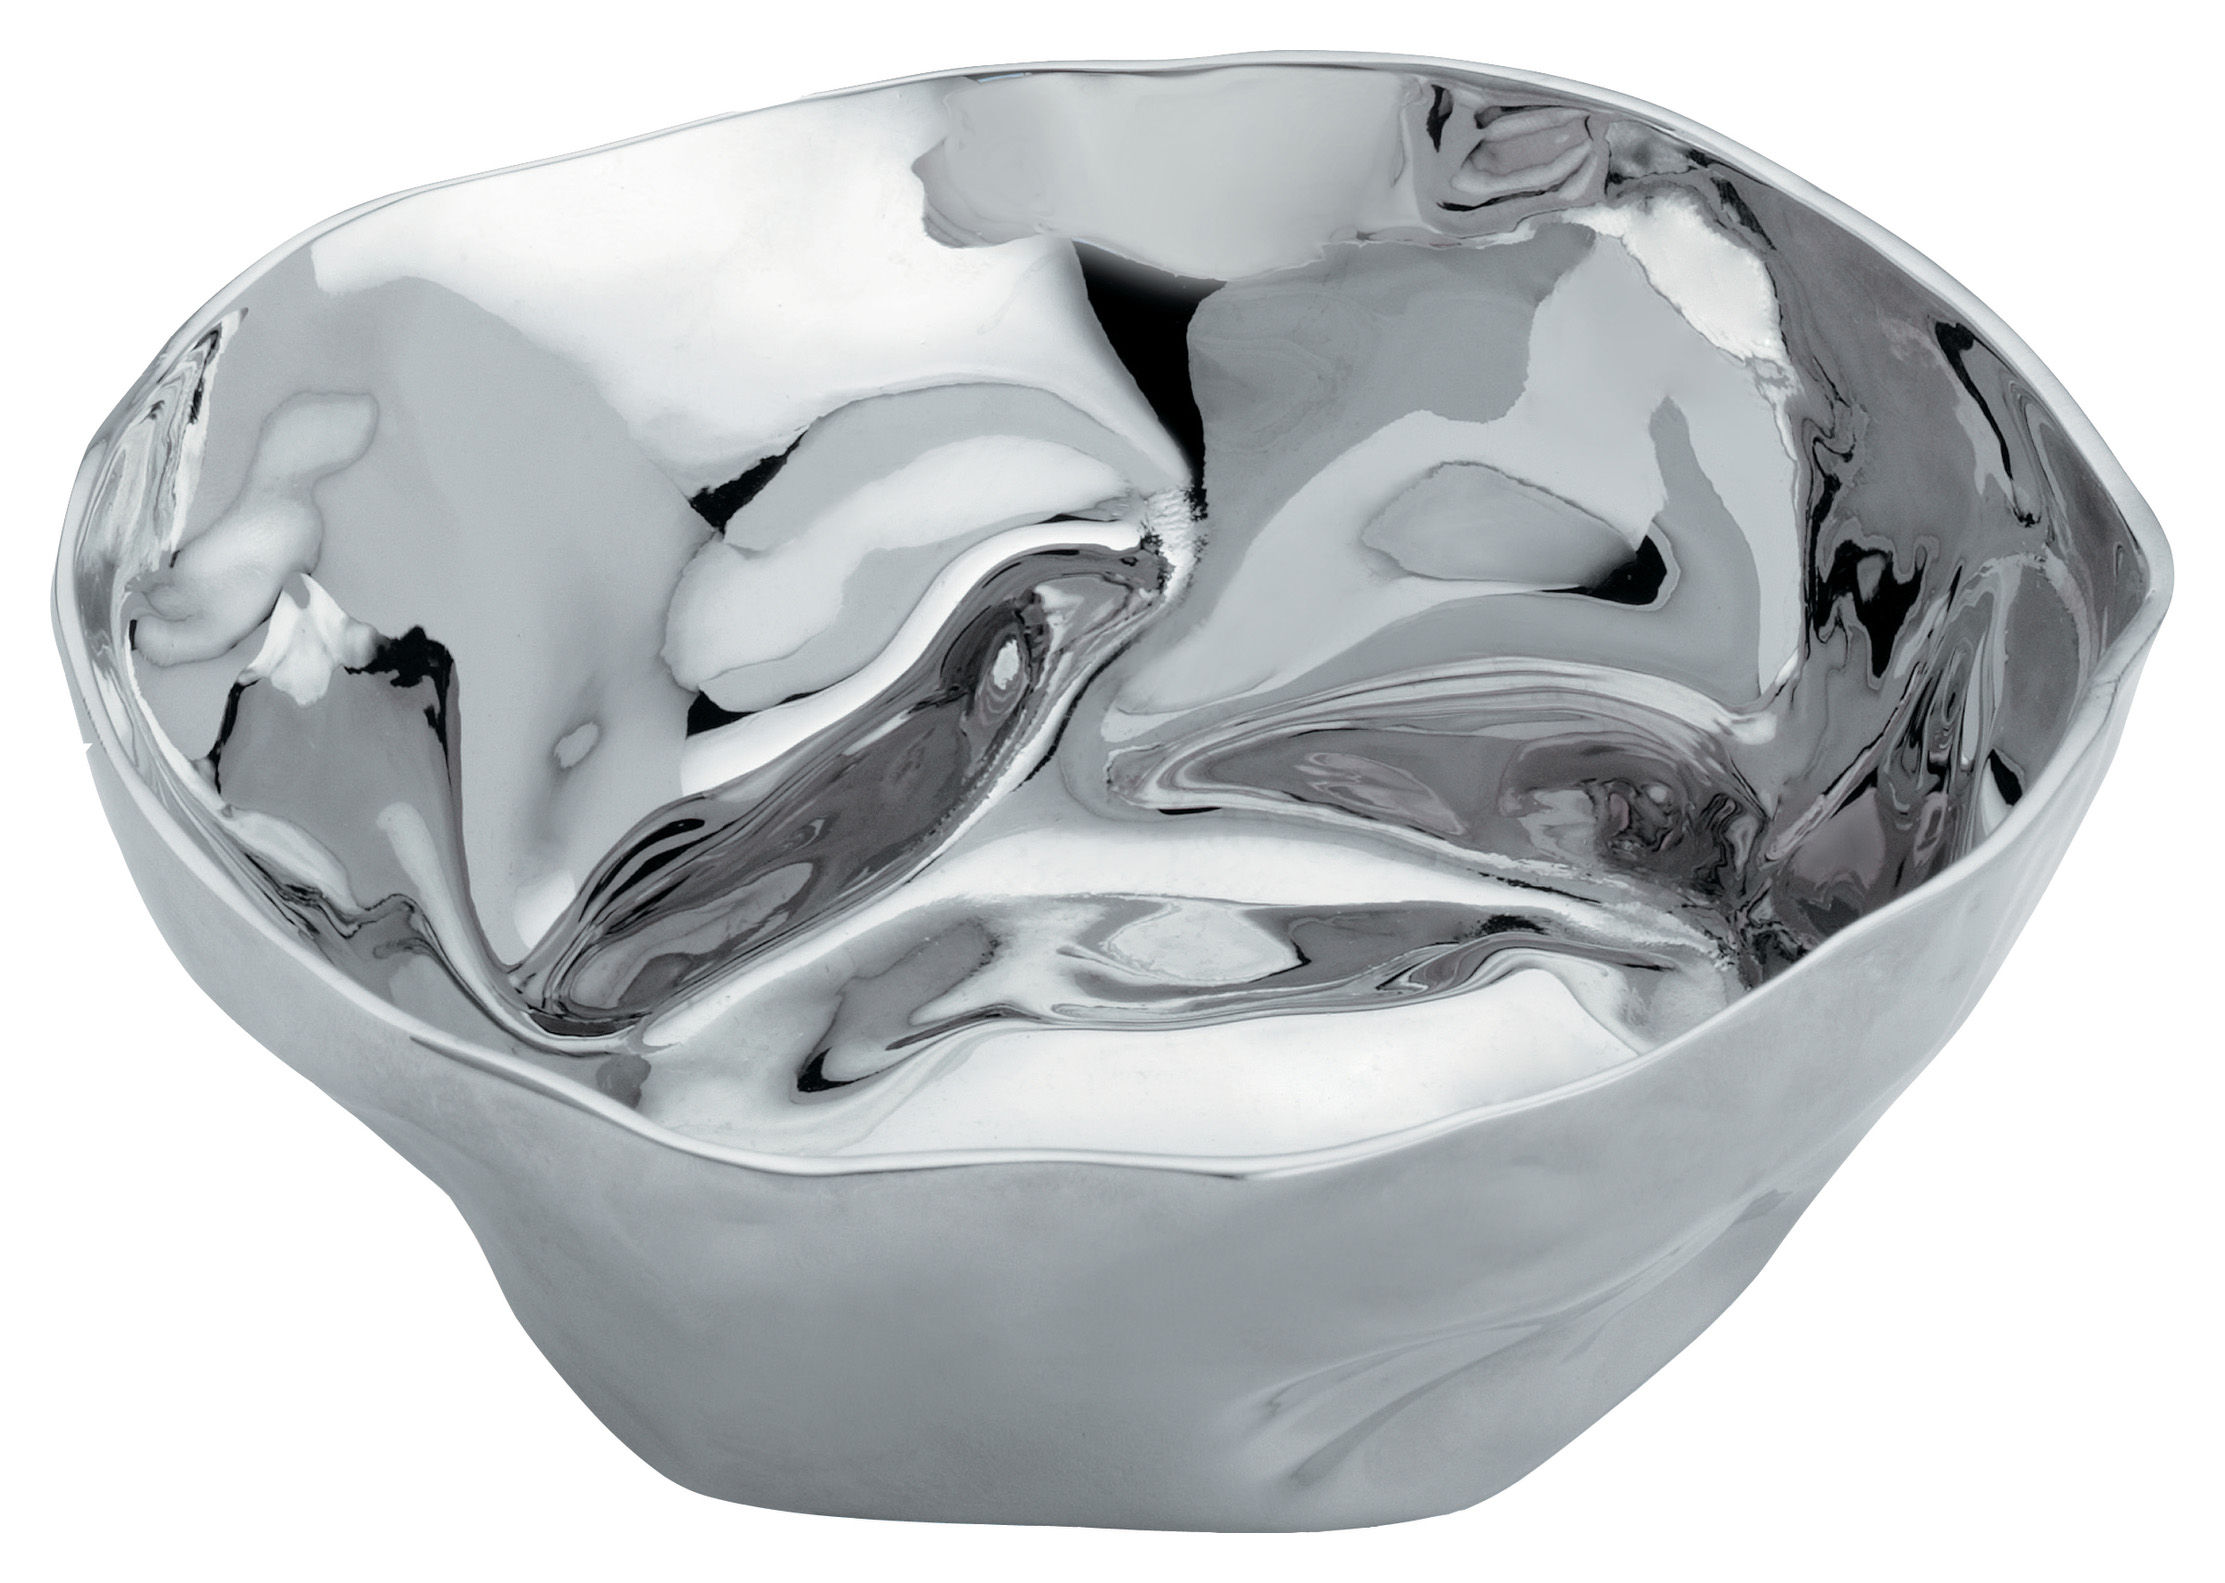 Arts de la table - Saladiers, coupes et bols - Coupelle Francesca / Lot de 2 - Alessi - Acier brillant - Acier inoxydable poli